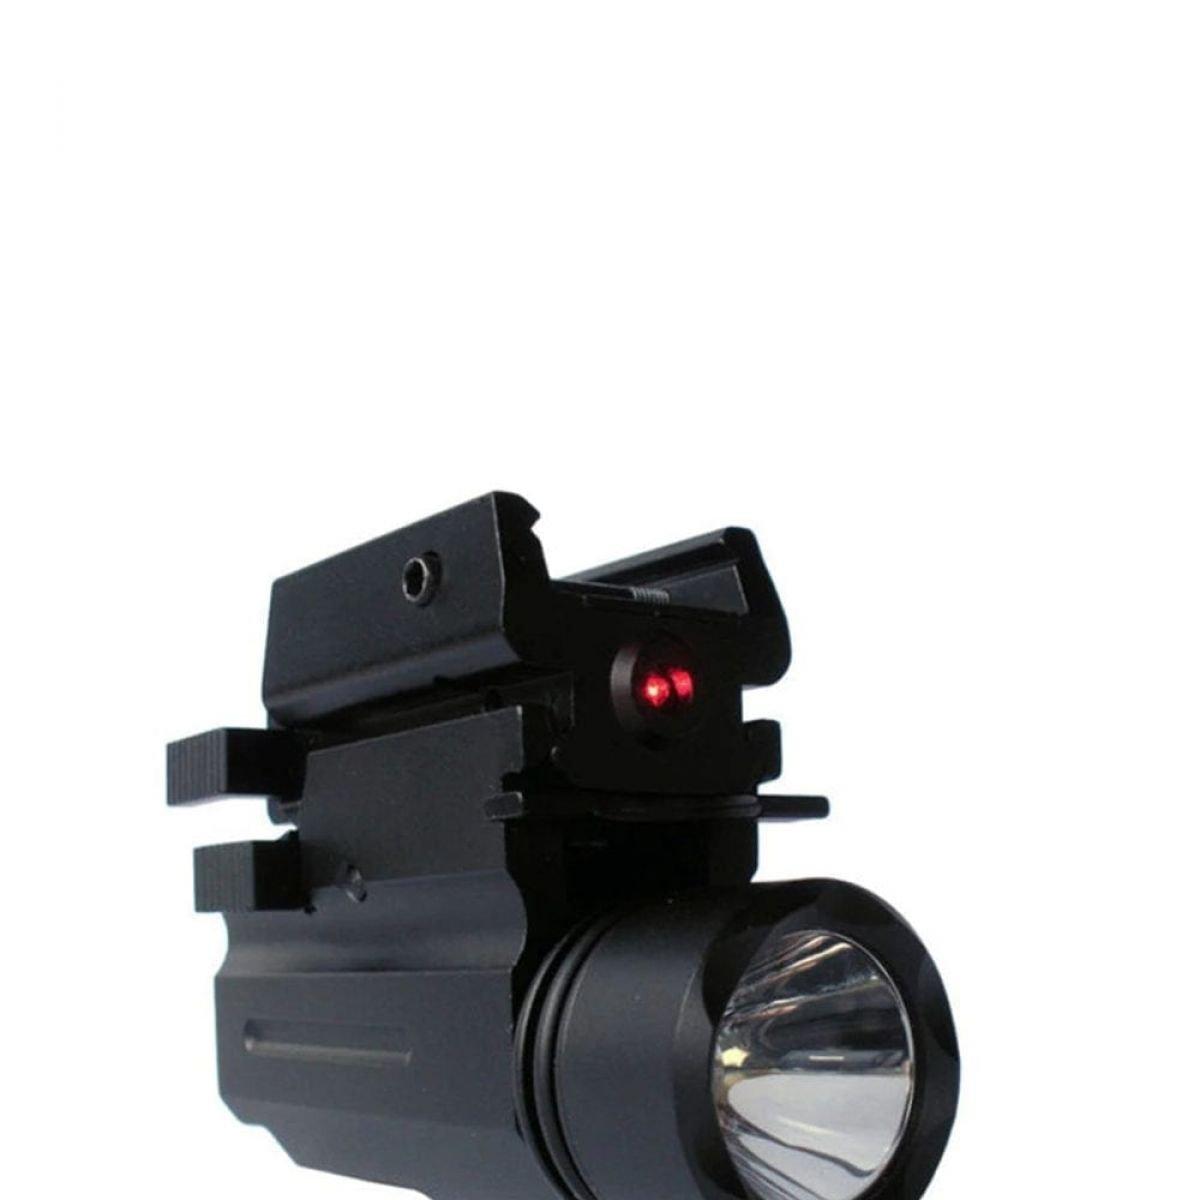 laser sight flash light gun accessory